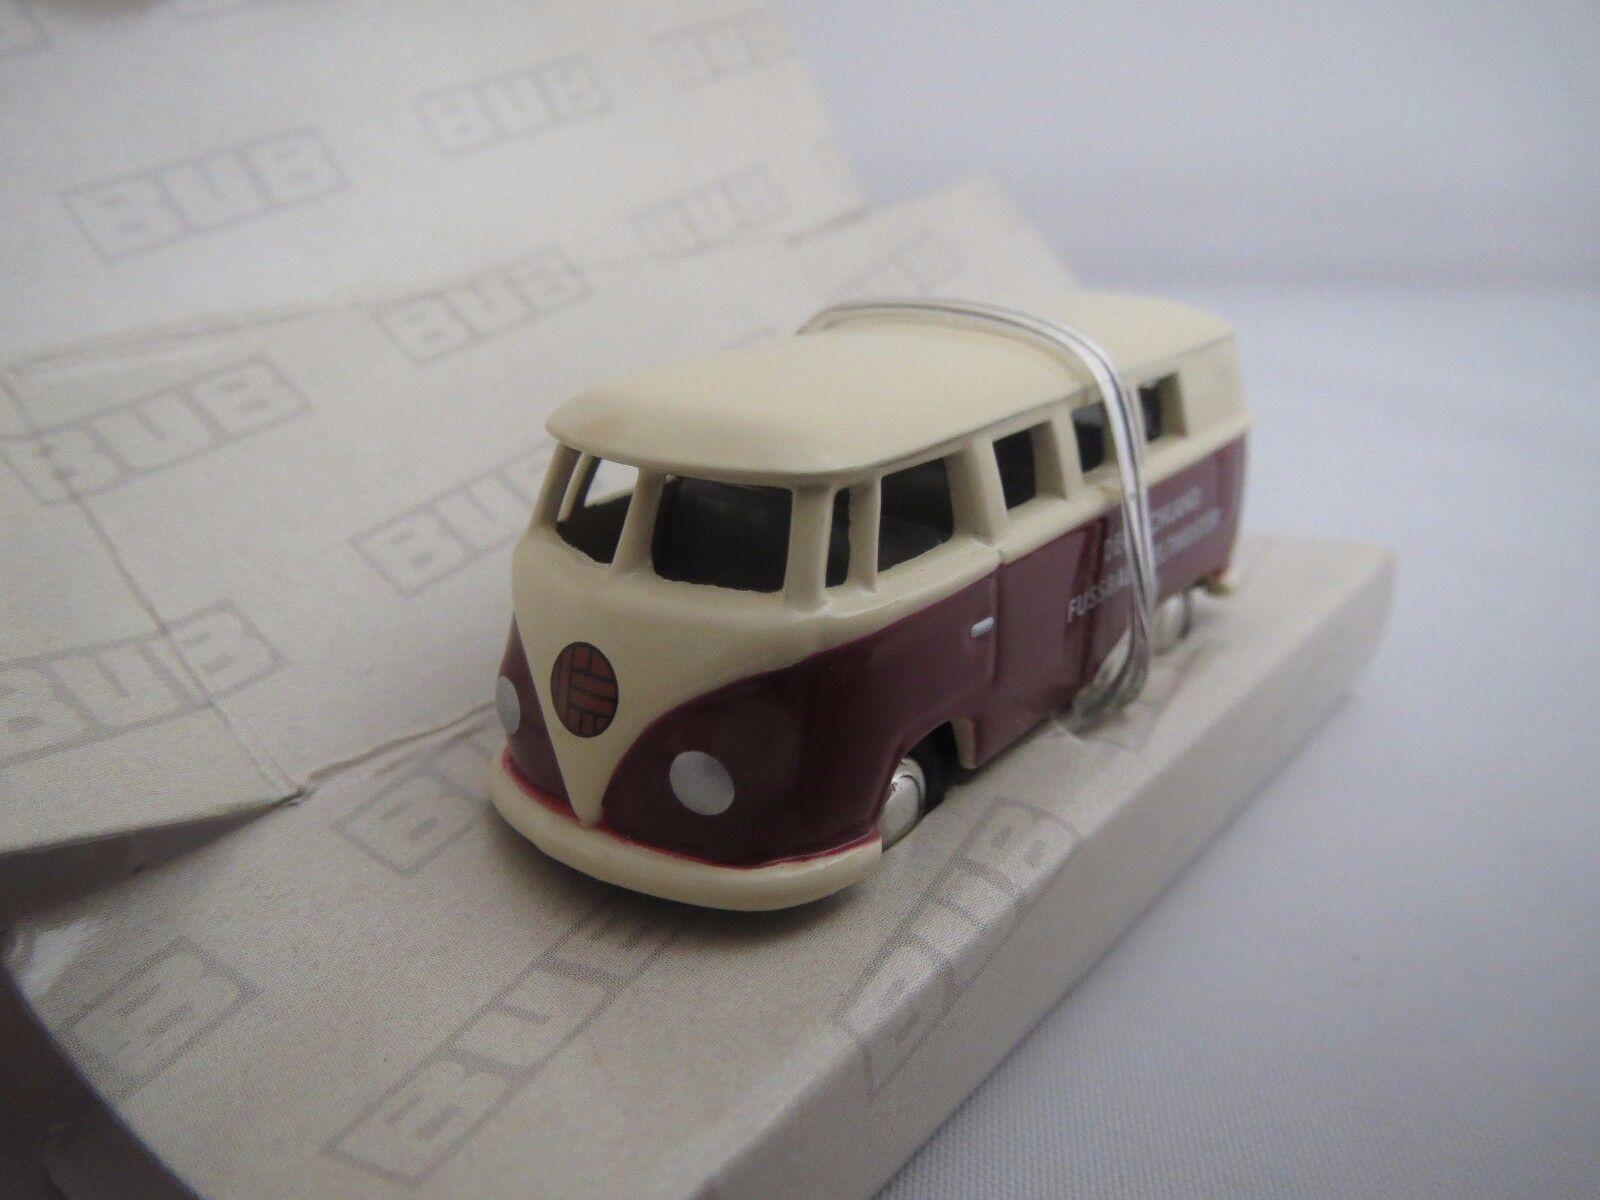 Bouèbe 06550 VW BULLY BUS (Champion du Monde 1954) 1 87 Neuf dans sa boîte